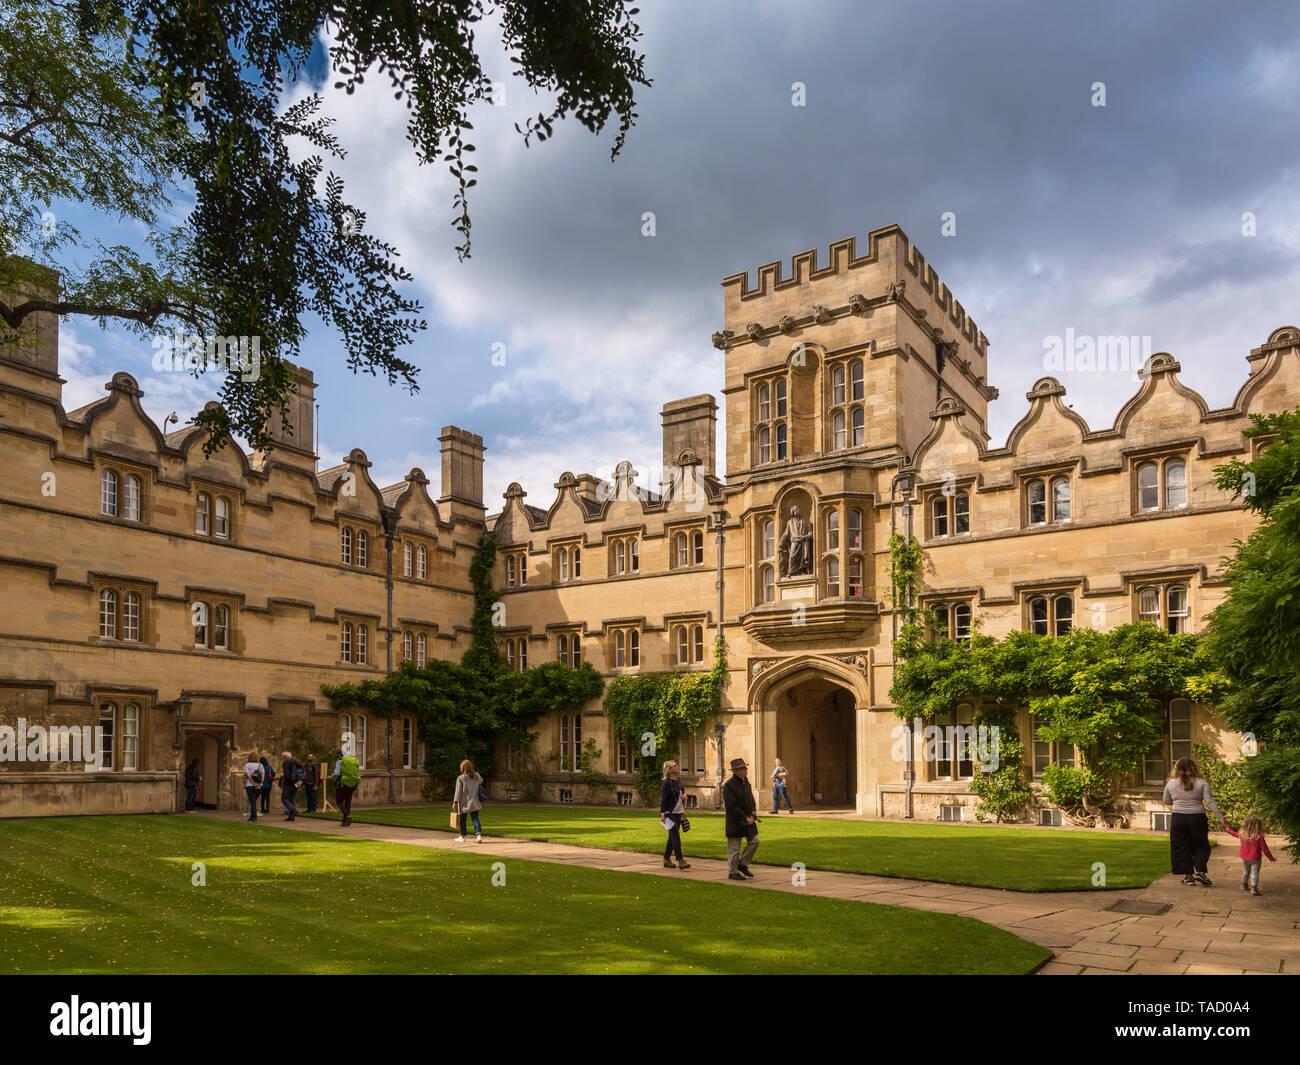 Radcliffe Quad, University College, Oxford, UK Stock Photo